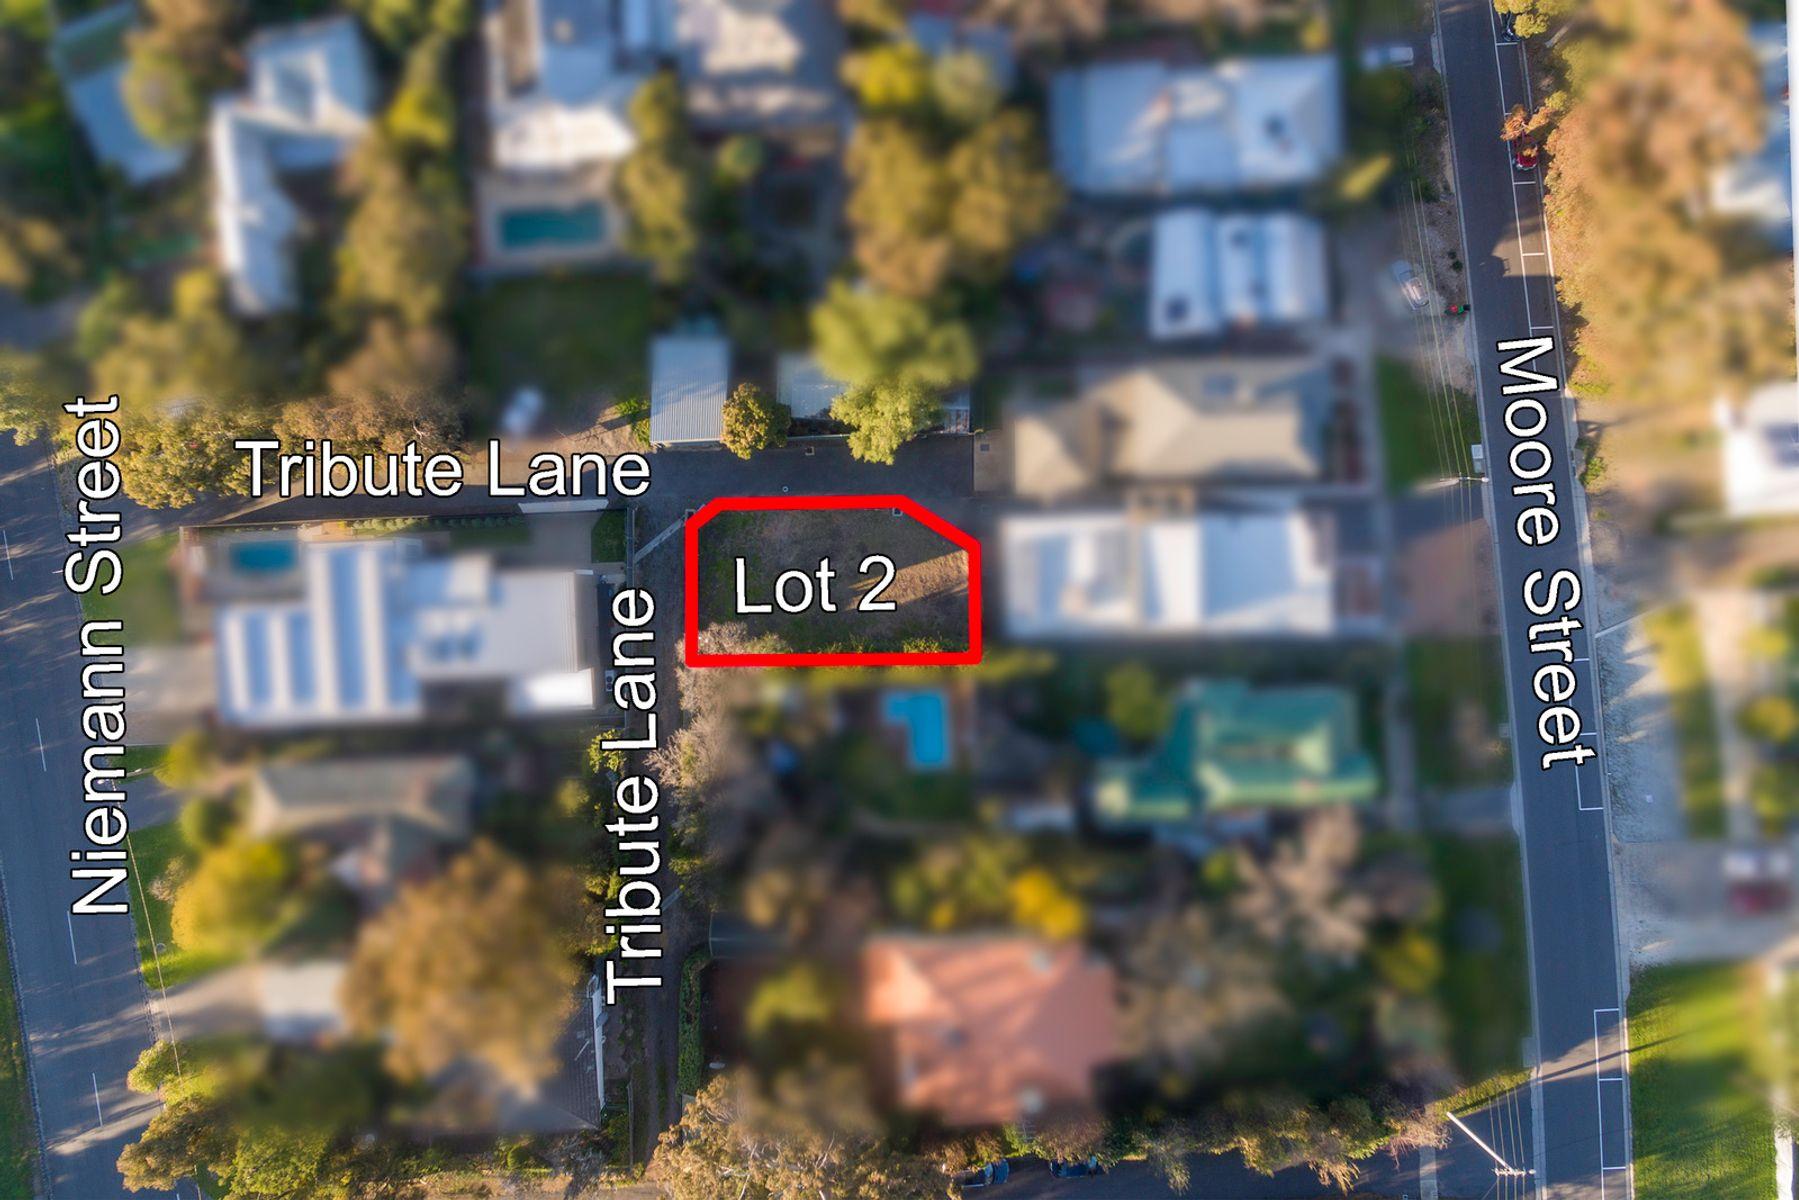 Lot 2/2 Tribute Lane, Bendigo, VIC 3550